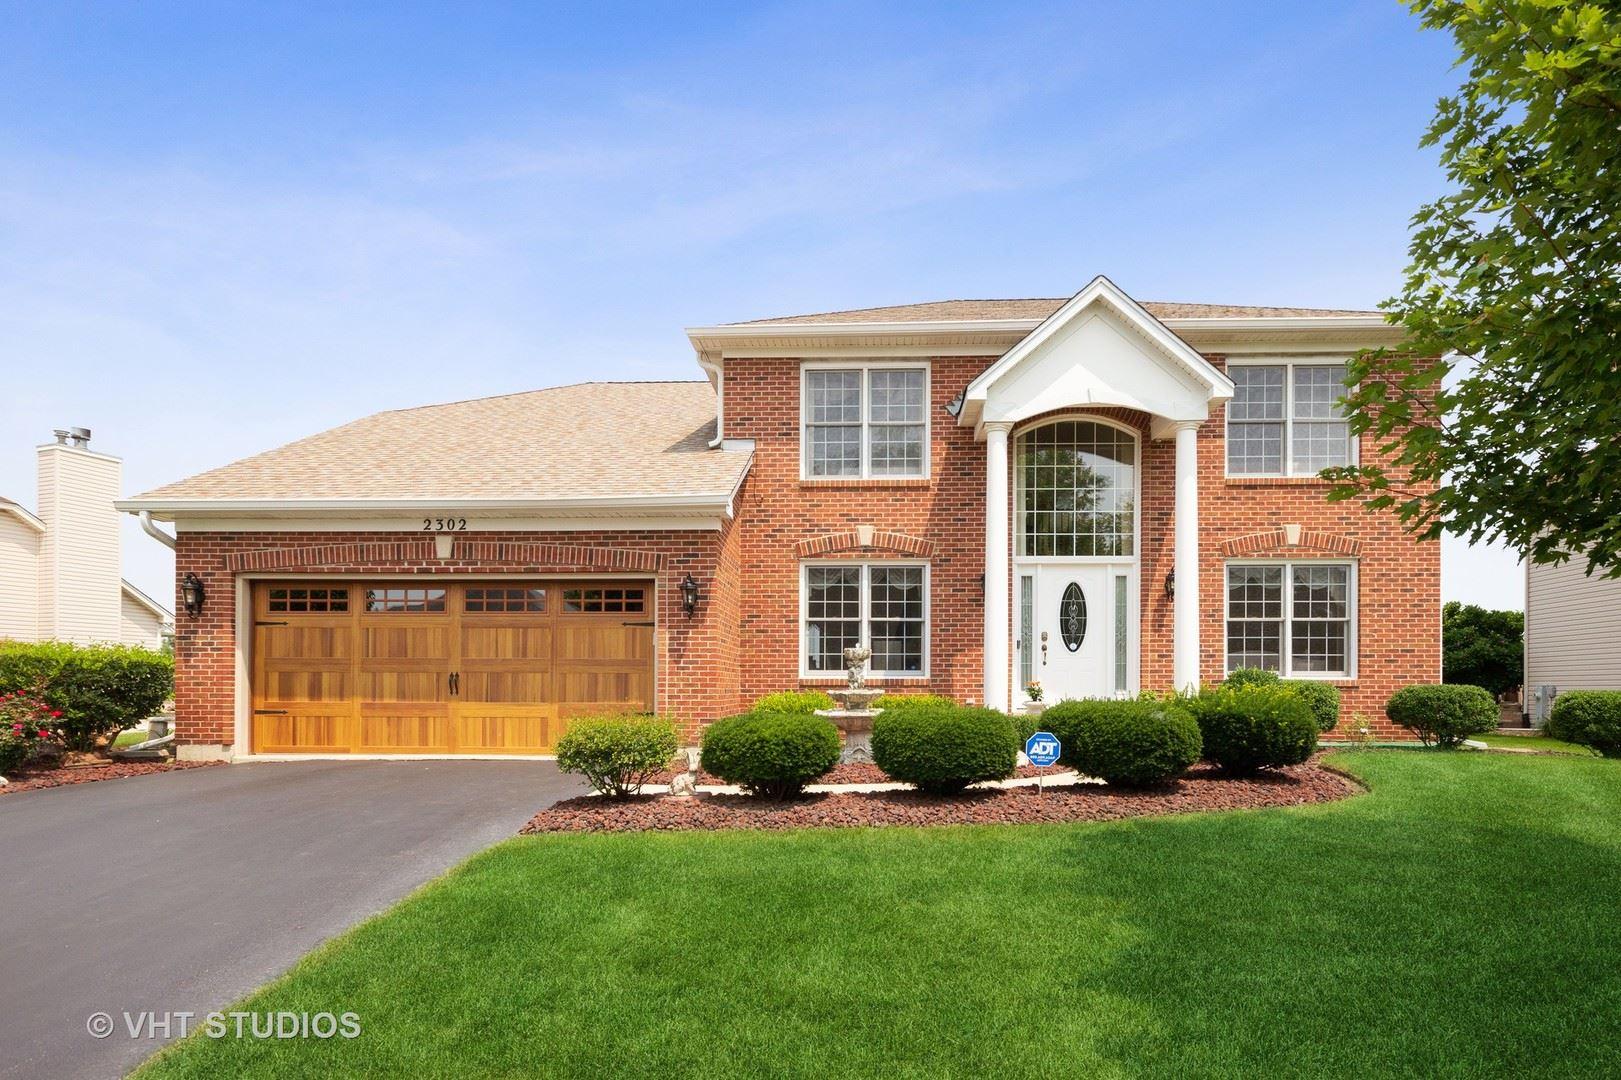 Photo of 2302 Irvine Lane, Plainfield, IL 60586 (MLS # 11163812)